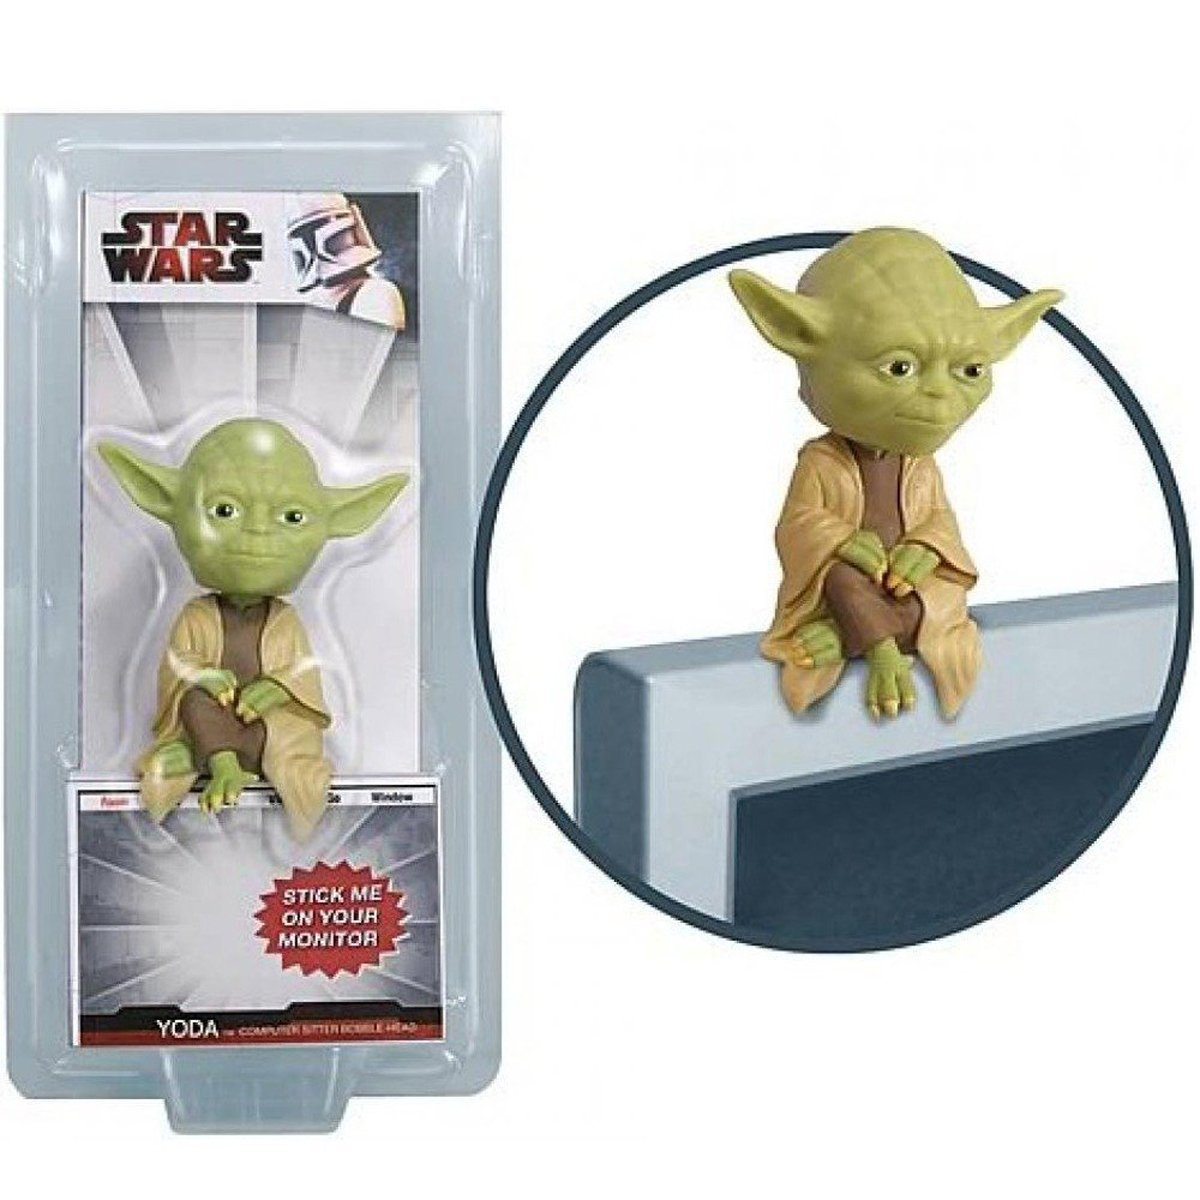 Star Wars Yoda Computer Sitter Figure